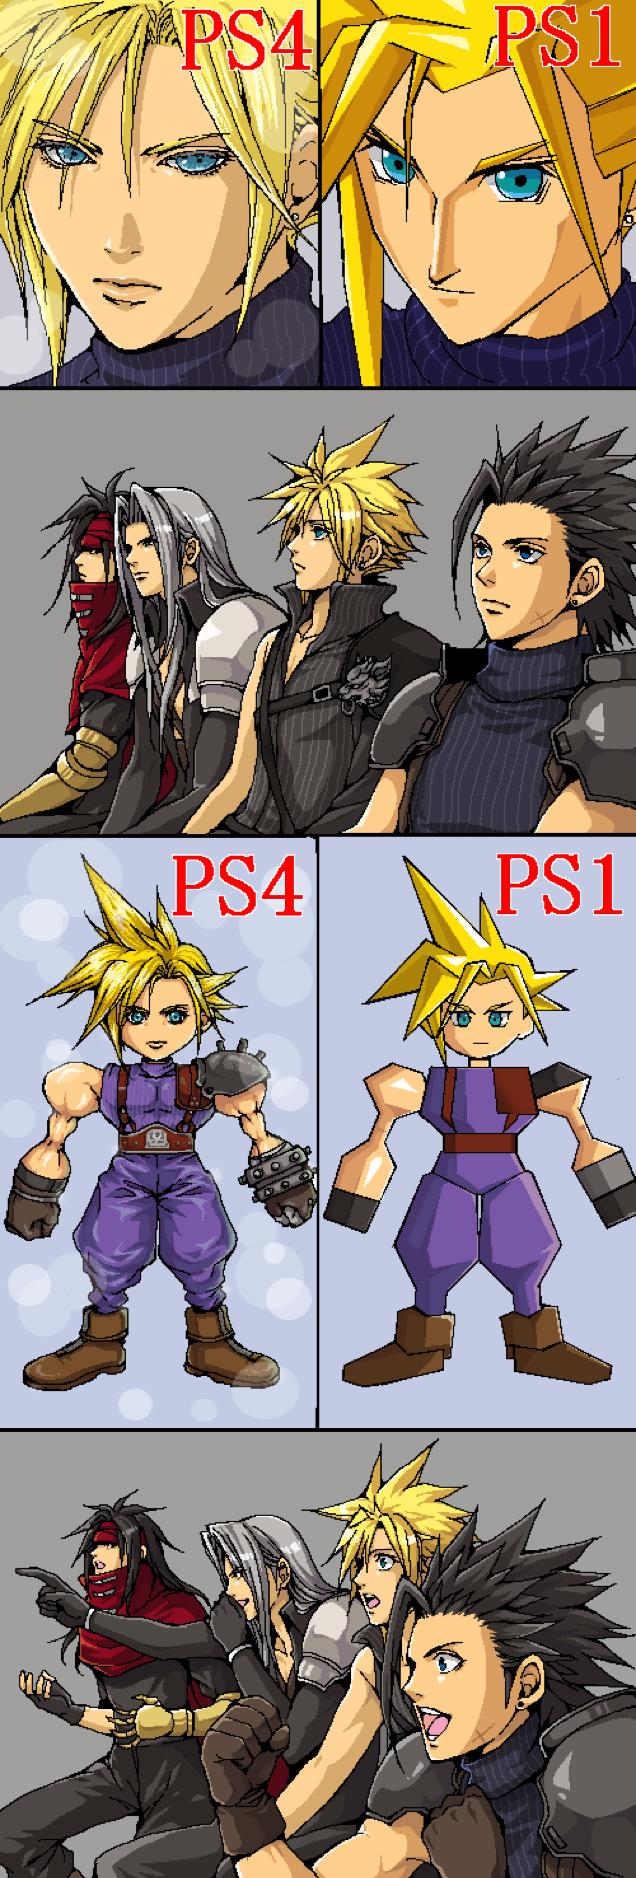 Ffvii Reaction Guys Final Fantasy Vii Know Your Meme